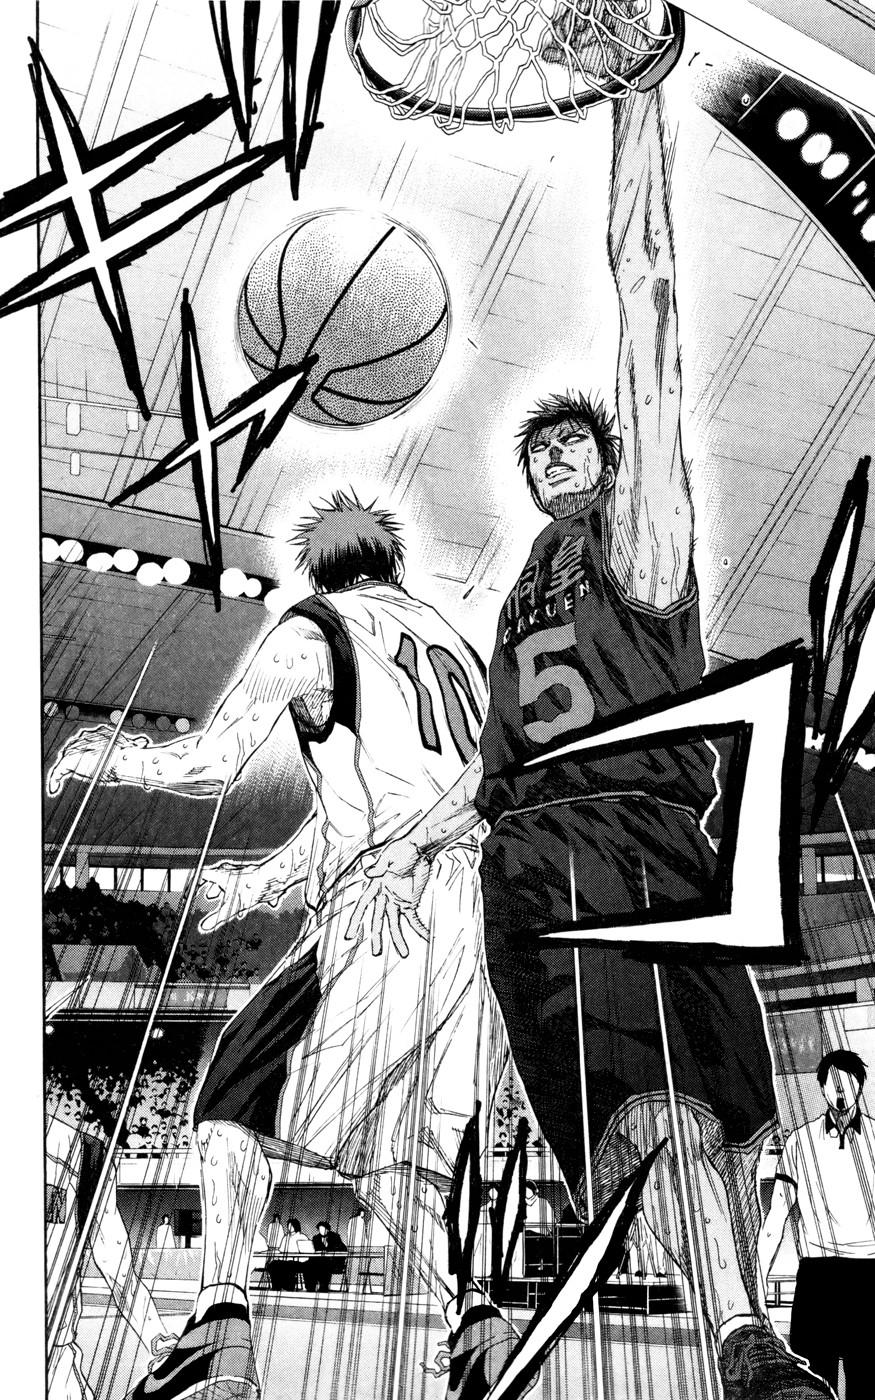 Kuroko no Basket Manga Chapter 127 - Image 16